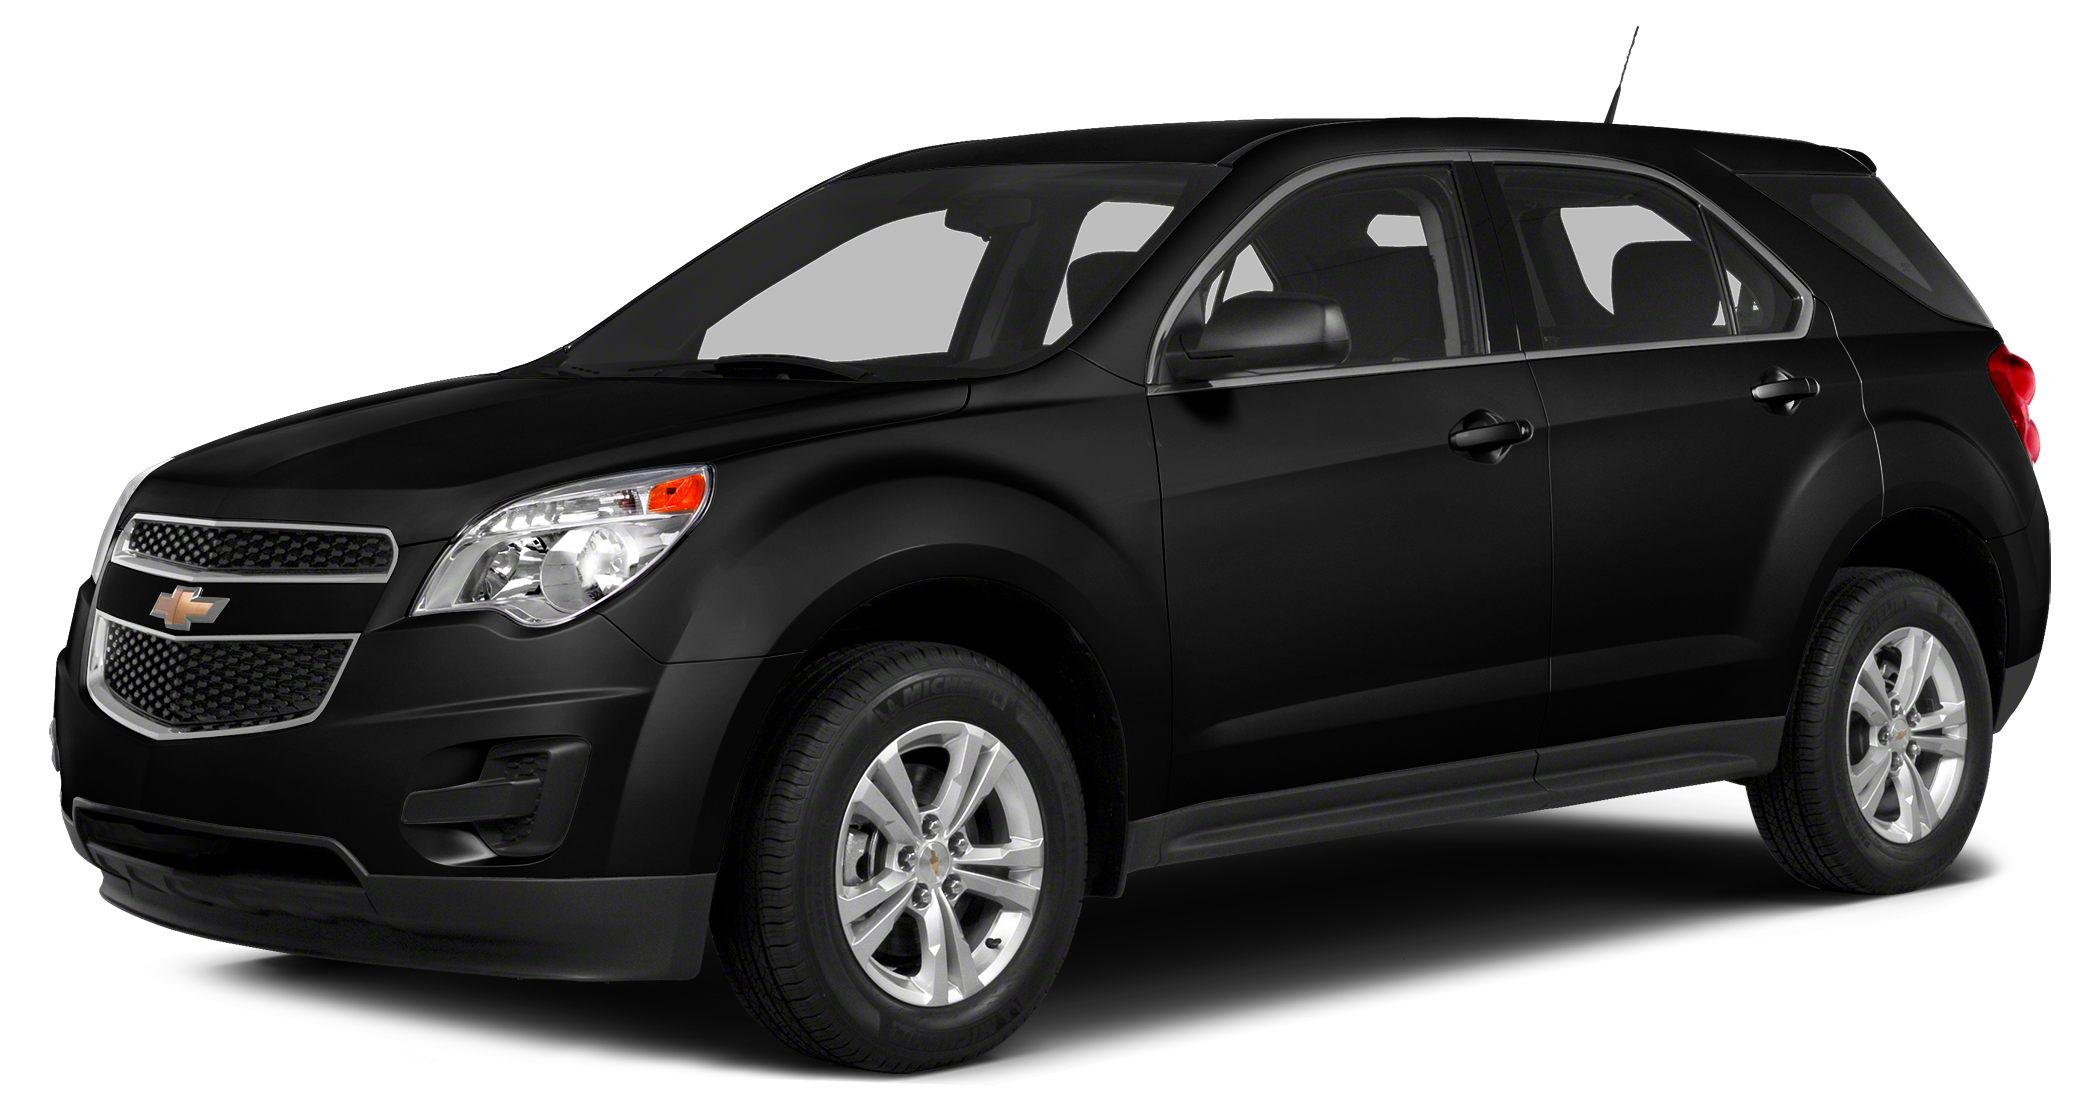 2013 Chevrolet Equinox LS WE OFFER FREE LIFETIME INSPECTION Miles 61875Color Black Stock P157